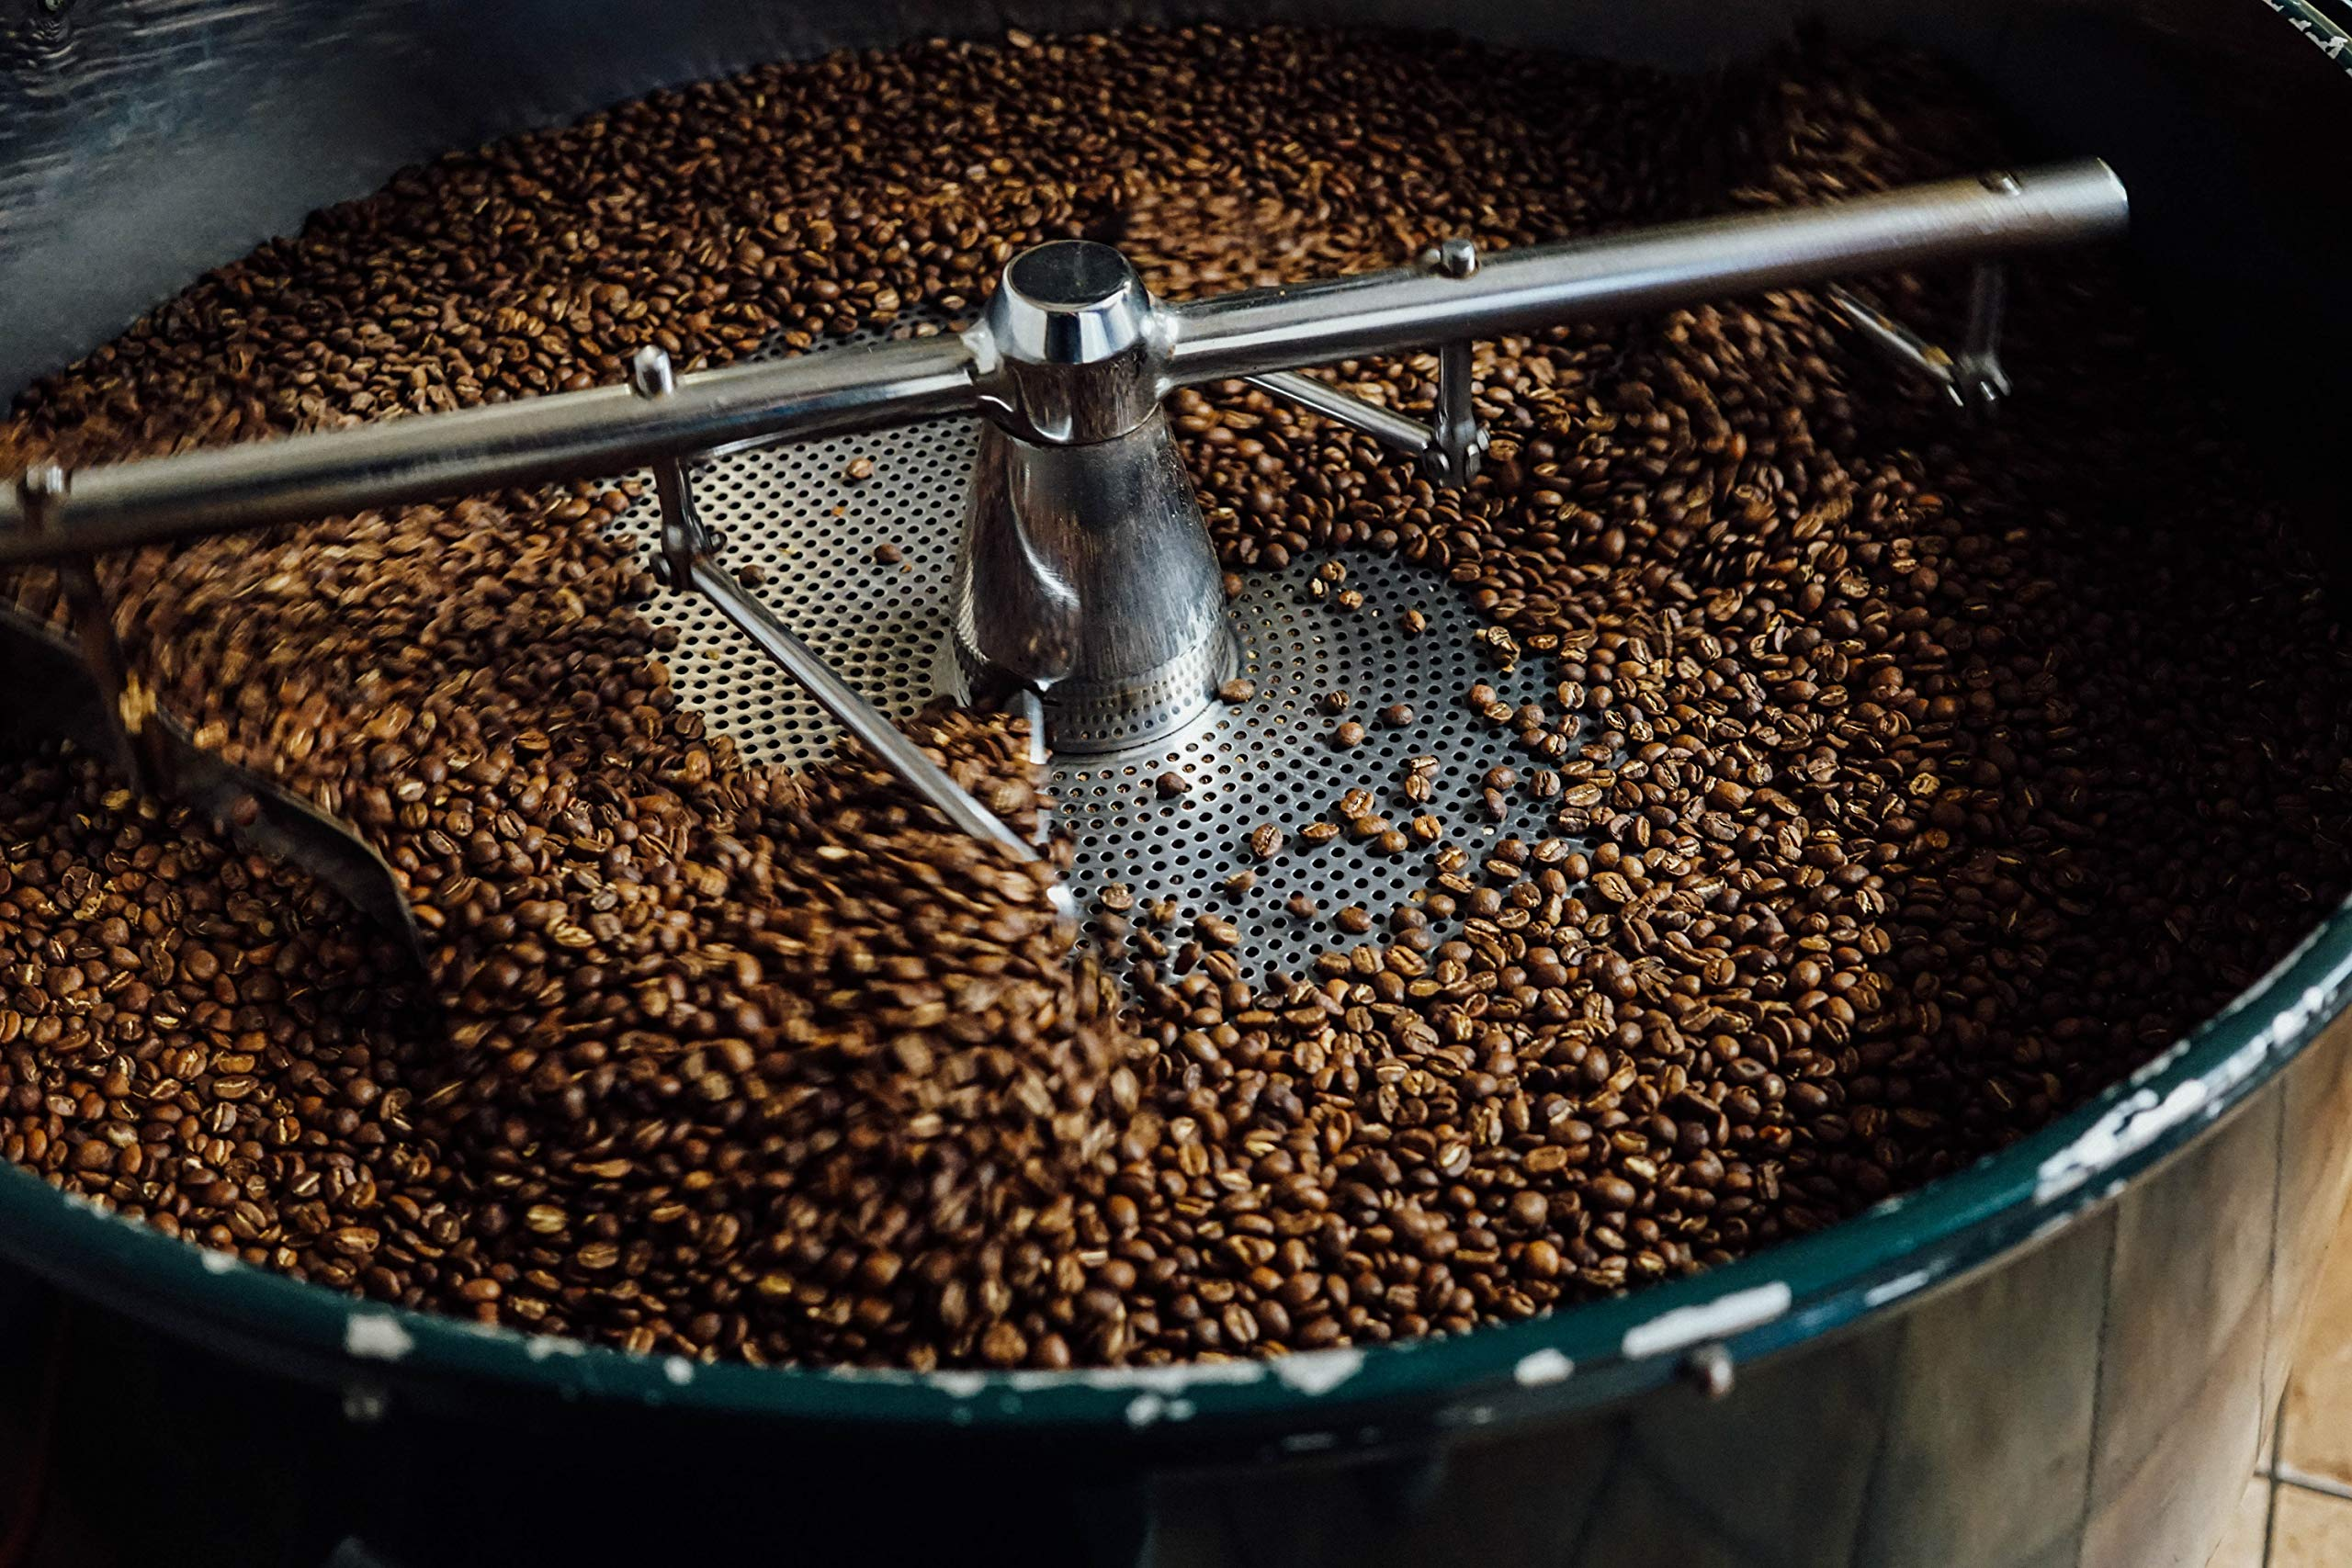 Presto Coffee Beans – Fresh Espresso Coffee – Medium Roast Whole Coffee Beans 1KG – Mid/Dark Roast Arabica – Great Taste Award Winner 2019